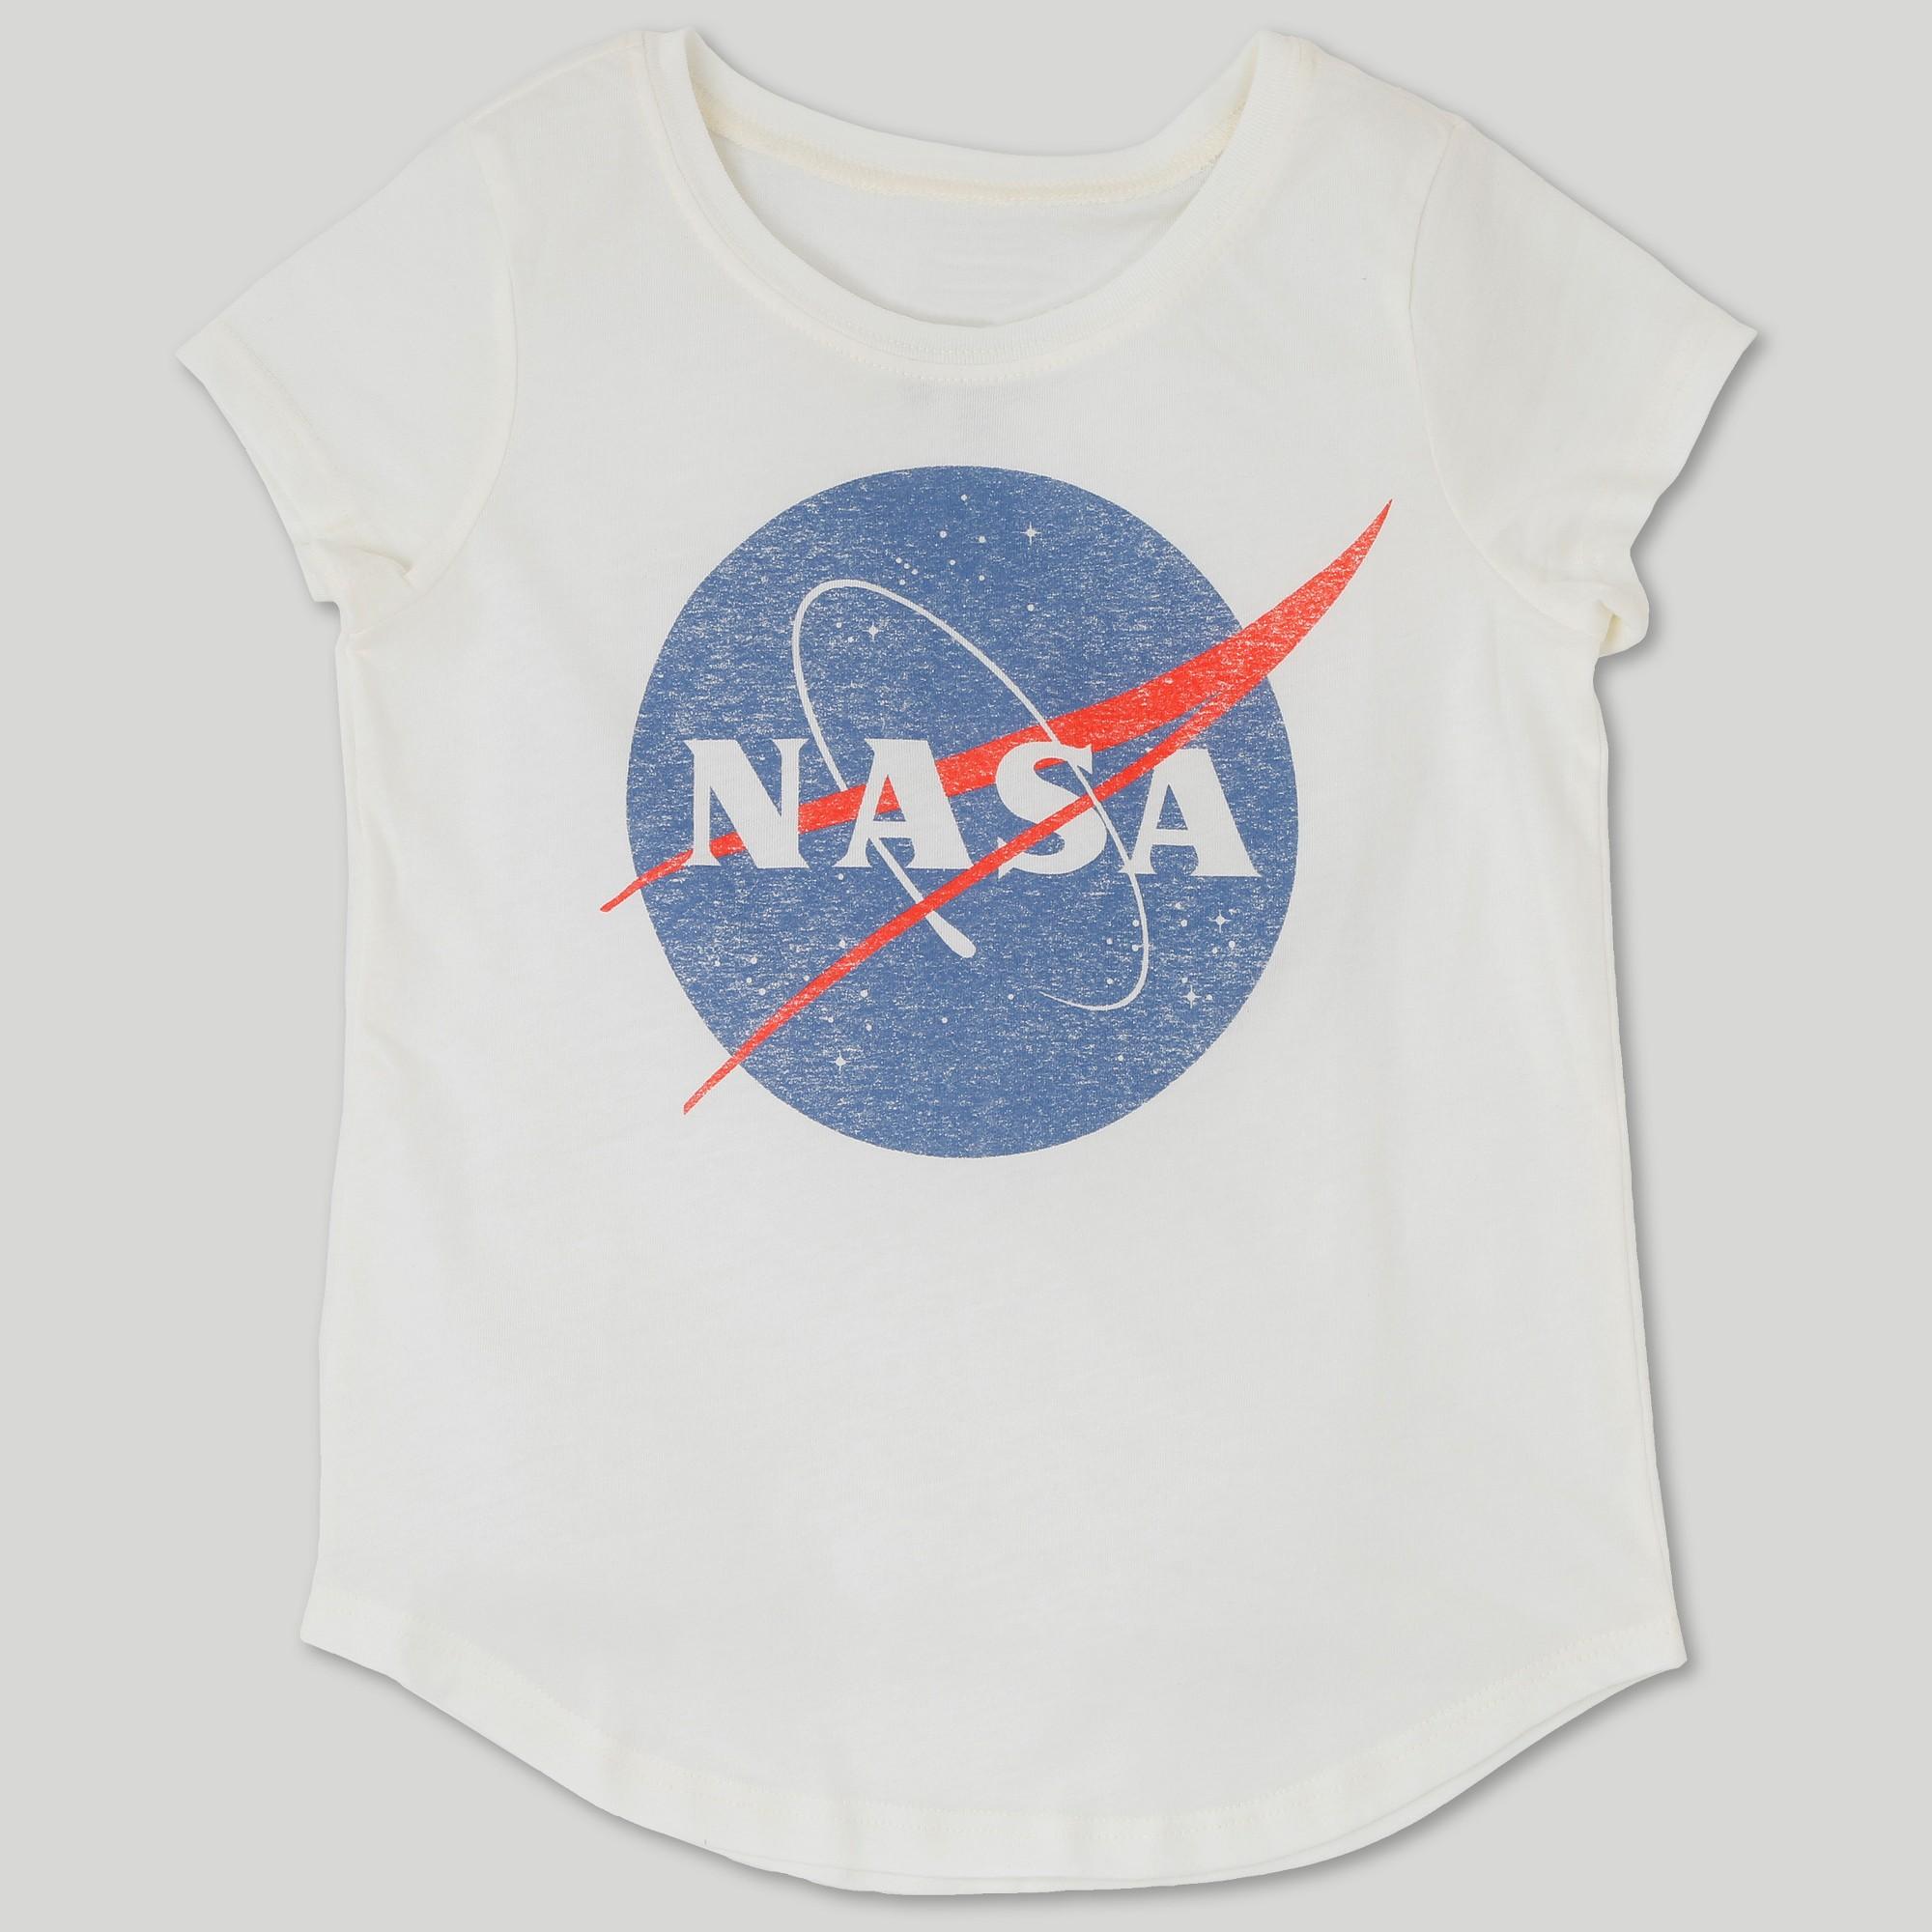 6ec91633b Plus Size L.O.L. Vintage Girls' Nasa Logo Cap Sleeve Graphic T-Shirt -  Ivory Xxl Plus, White